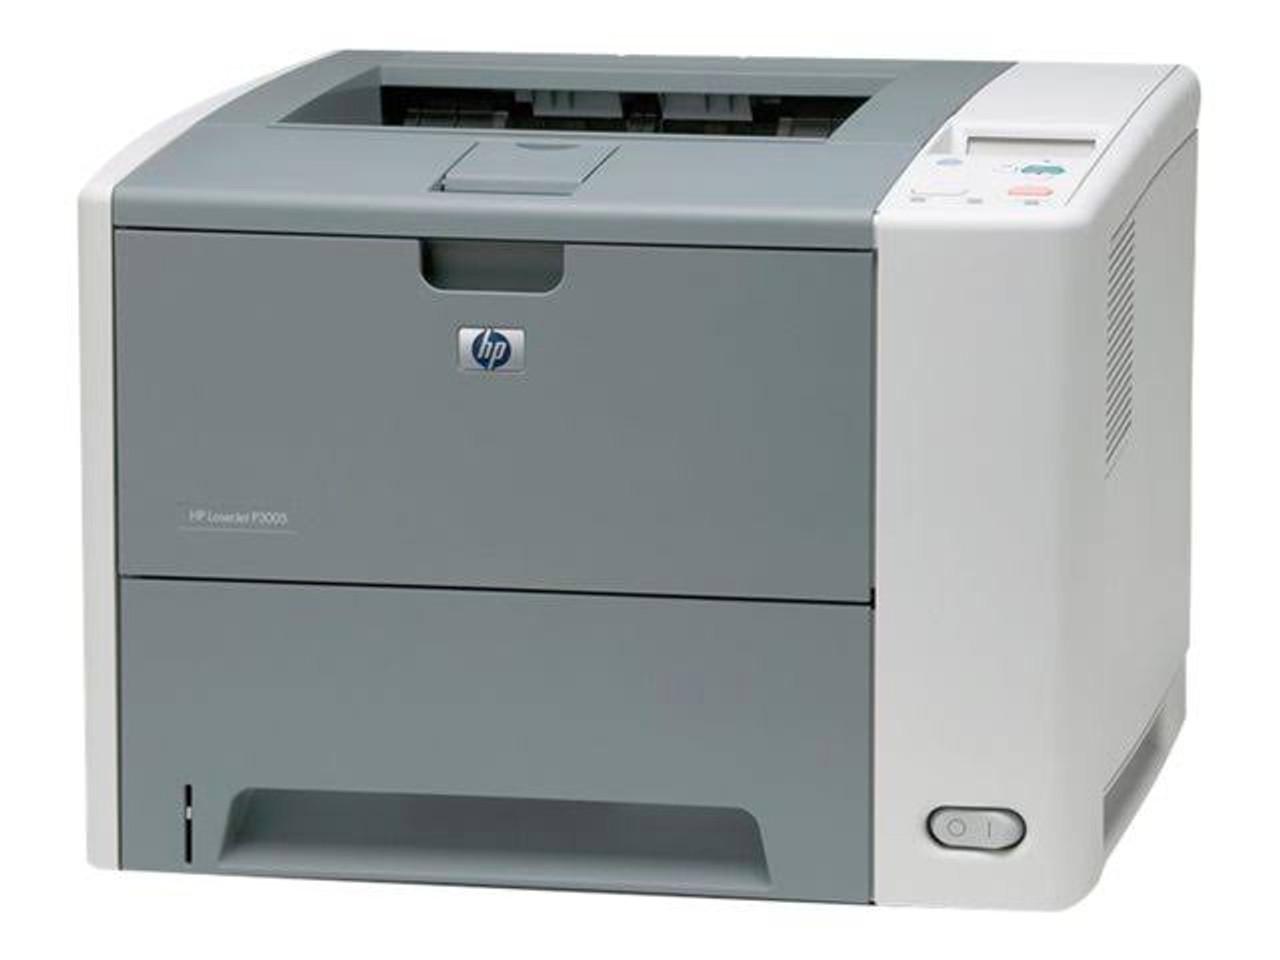 HP LaserJet P3005 - Q7812A#ABA - HP Laser Printer for sale